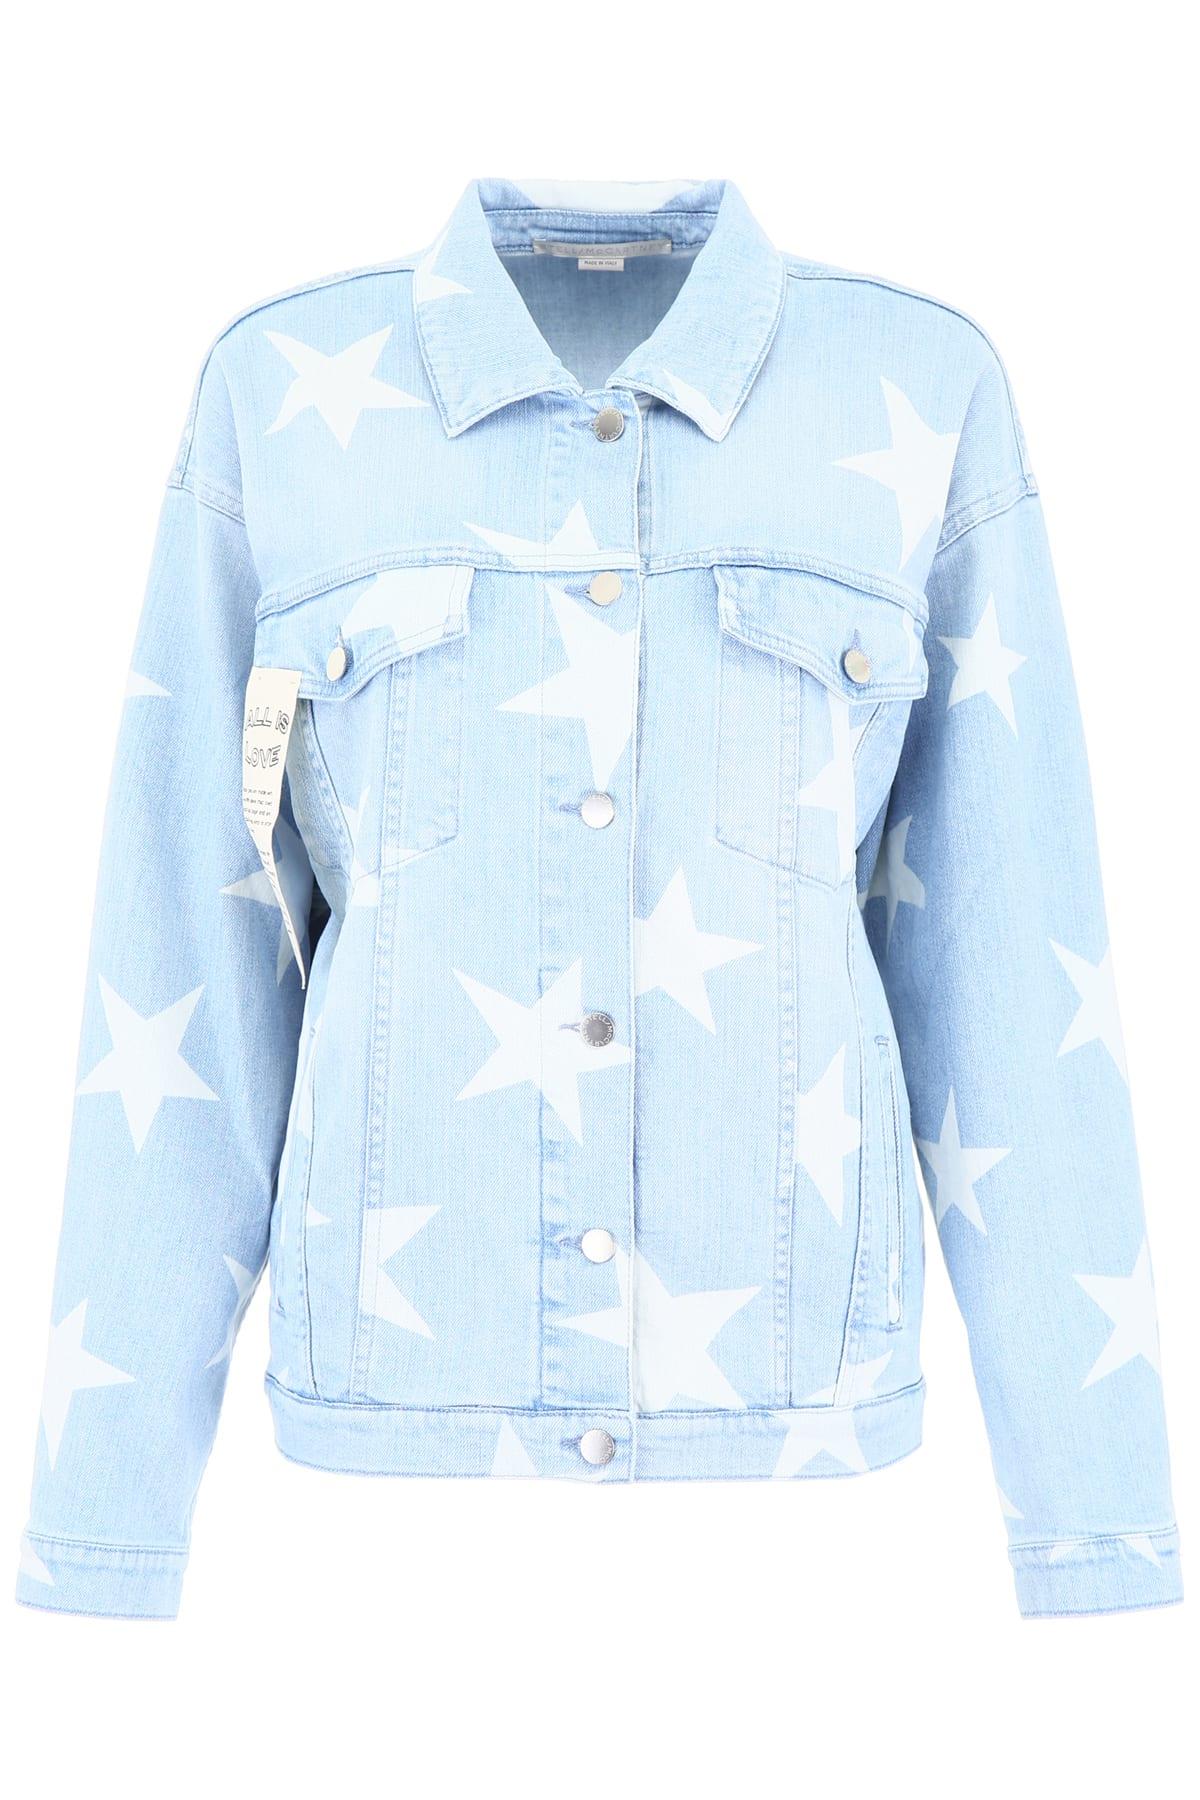 Stella McCartney Star Print Jacket